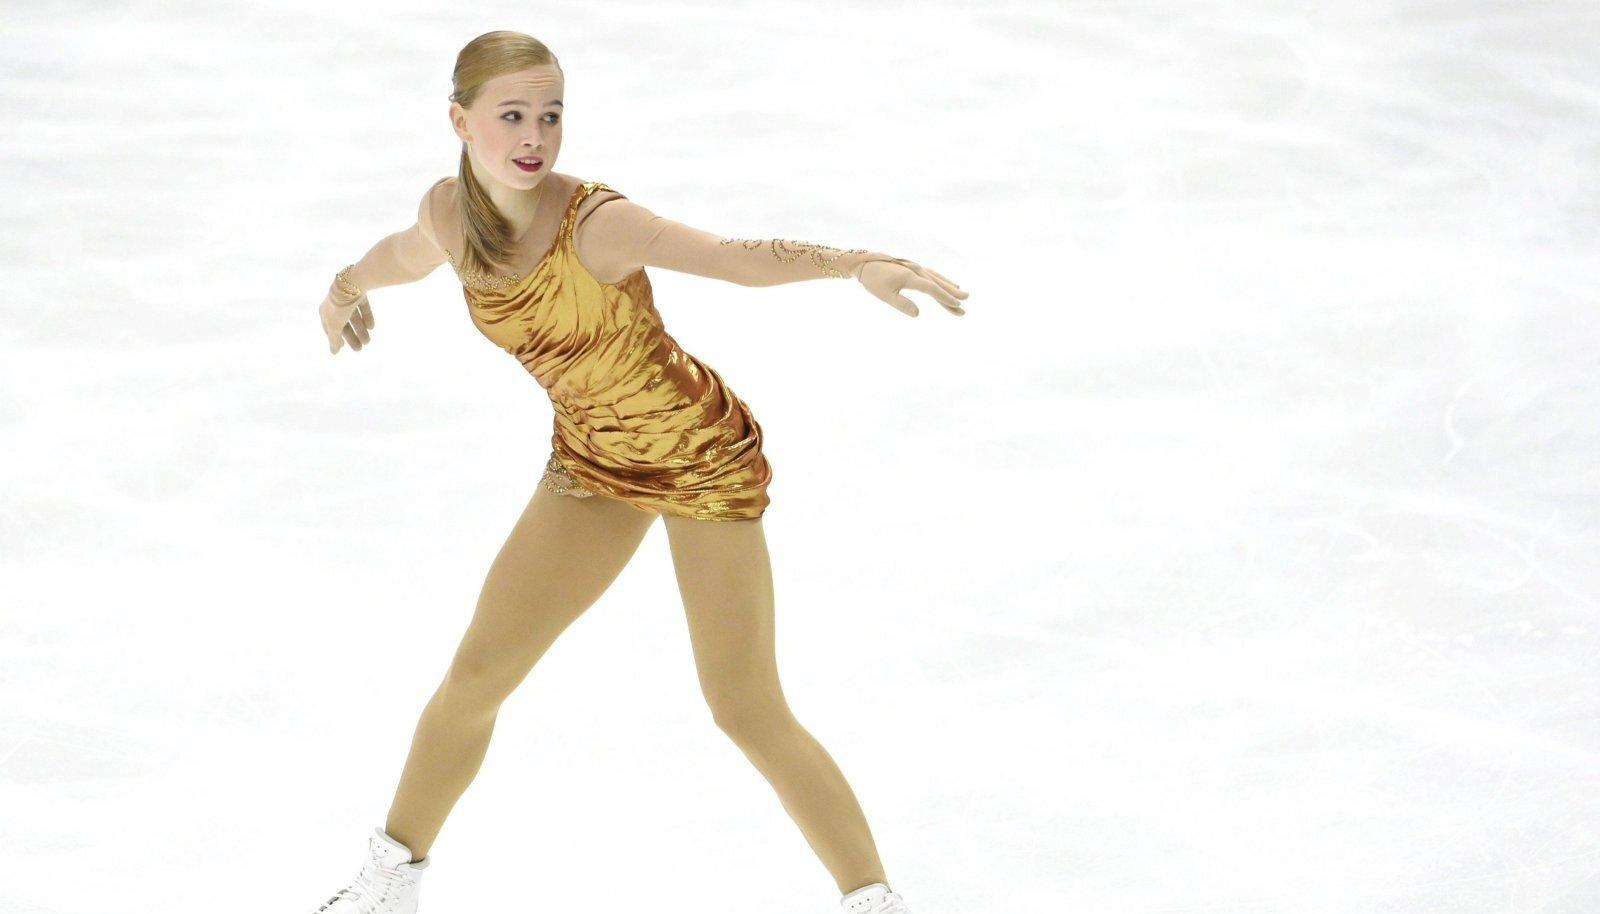 Eva-Lotta Kiibus Finlandia Trophy võistlusel vabakava esitamas.